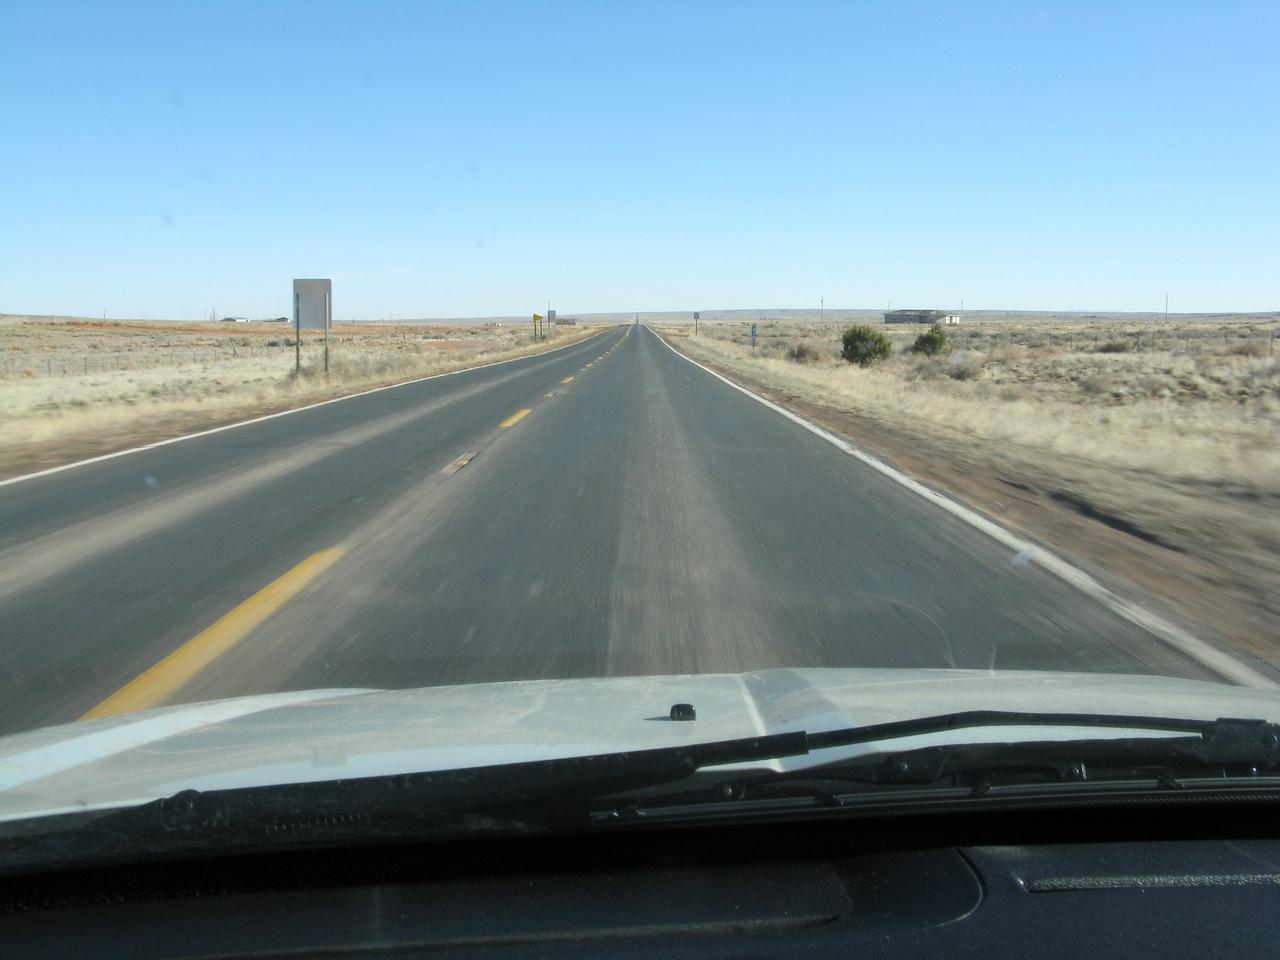 In Ganado, we turned north towards Chinle.